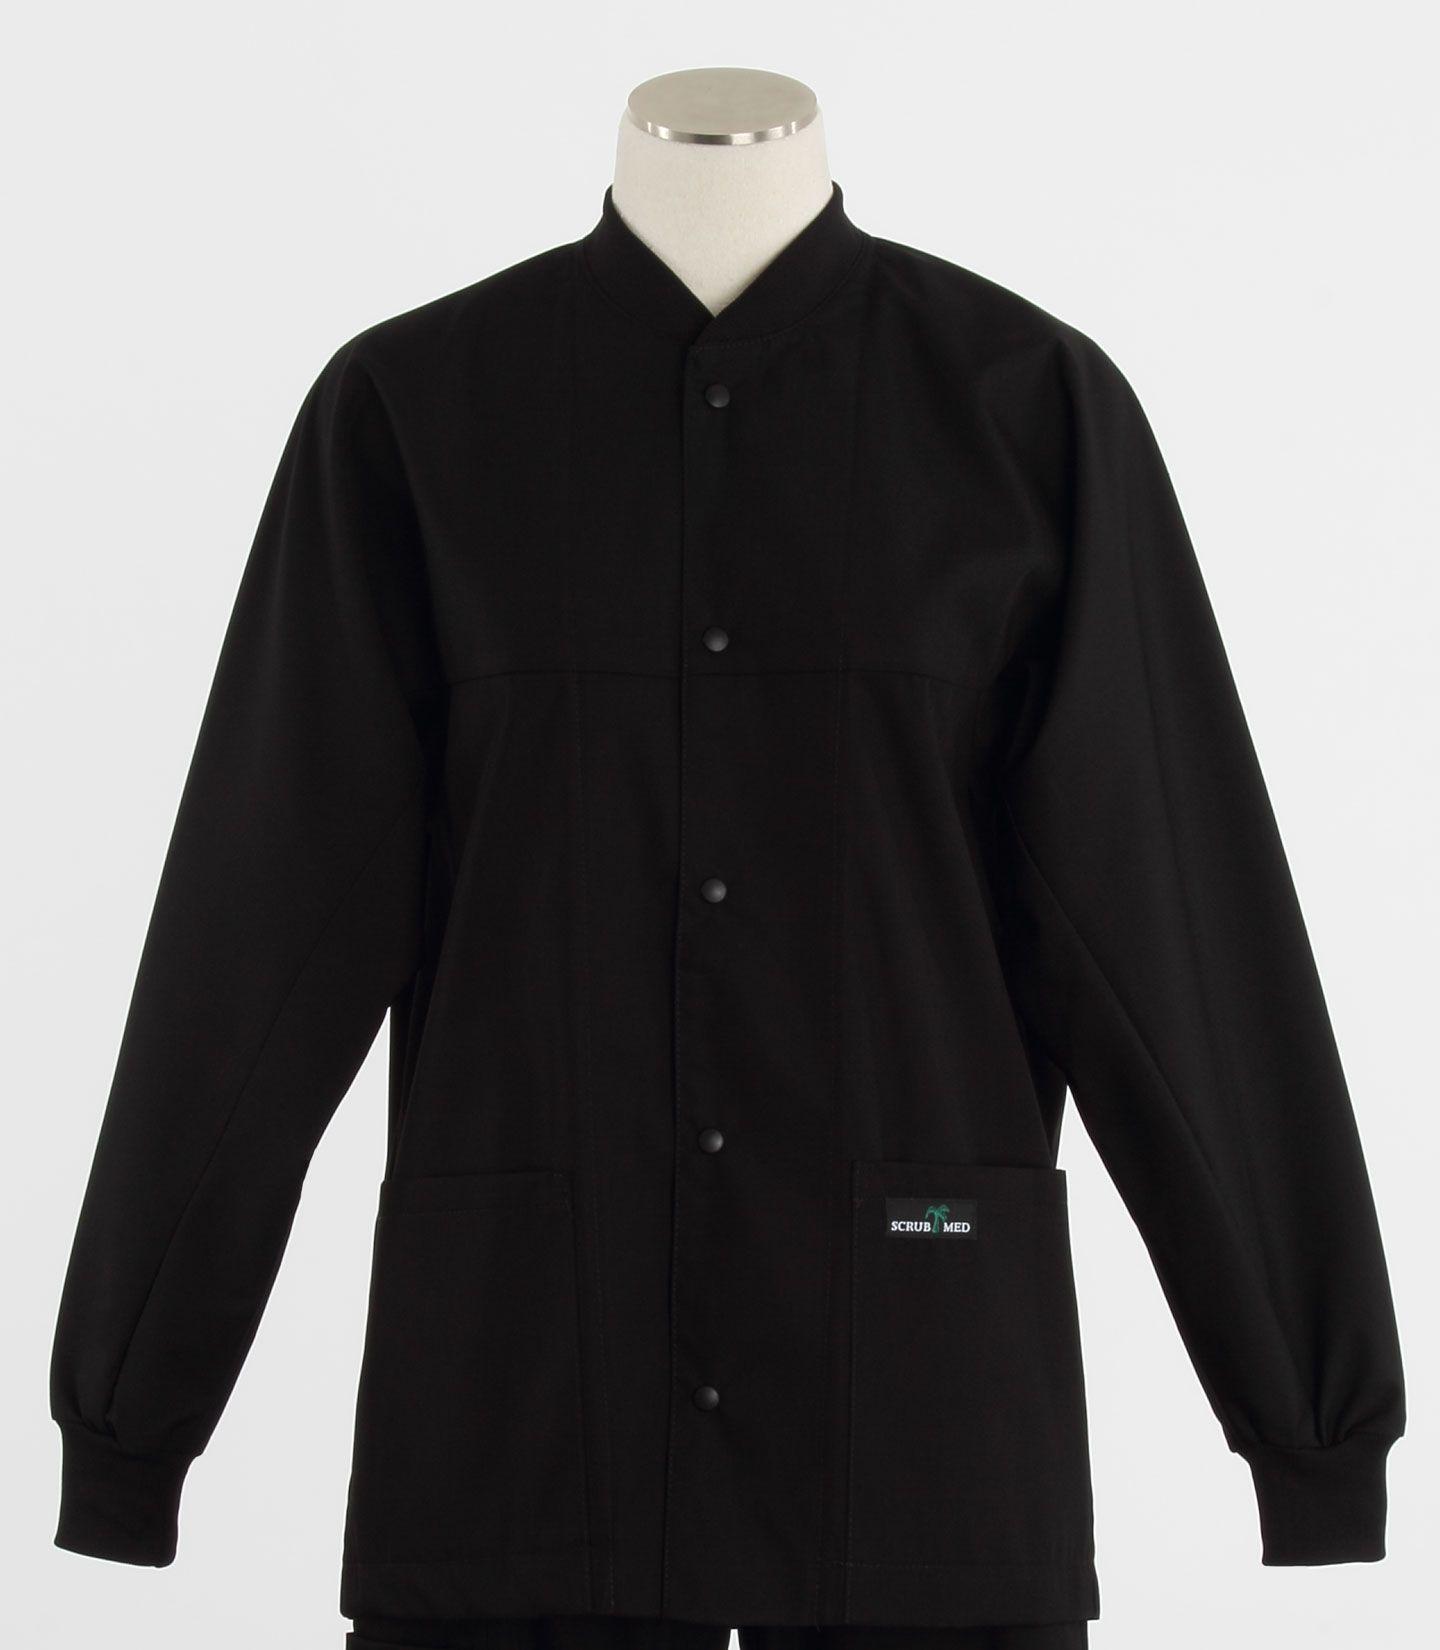 Black and white scrub jacket